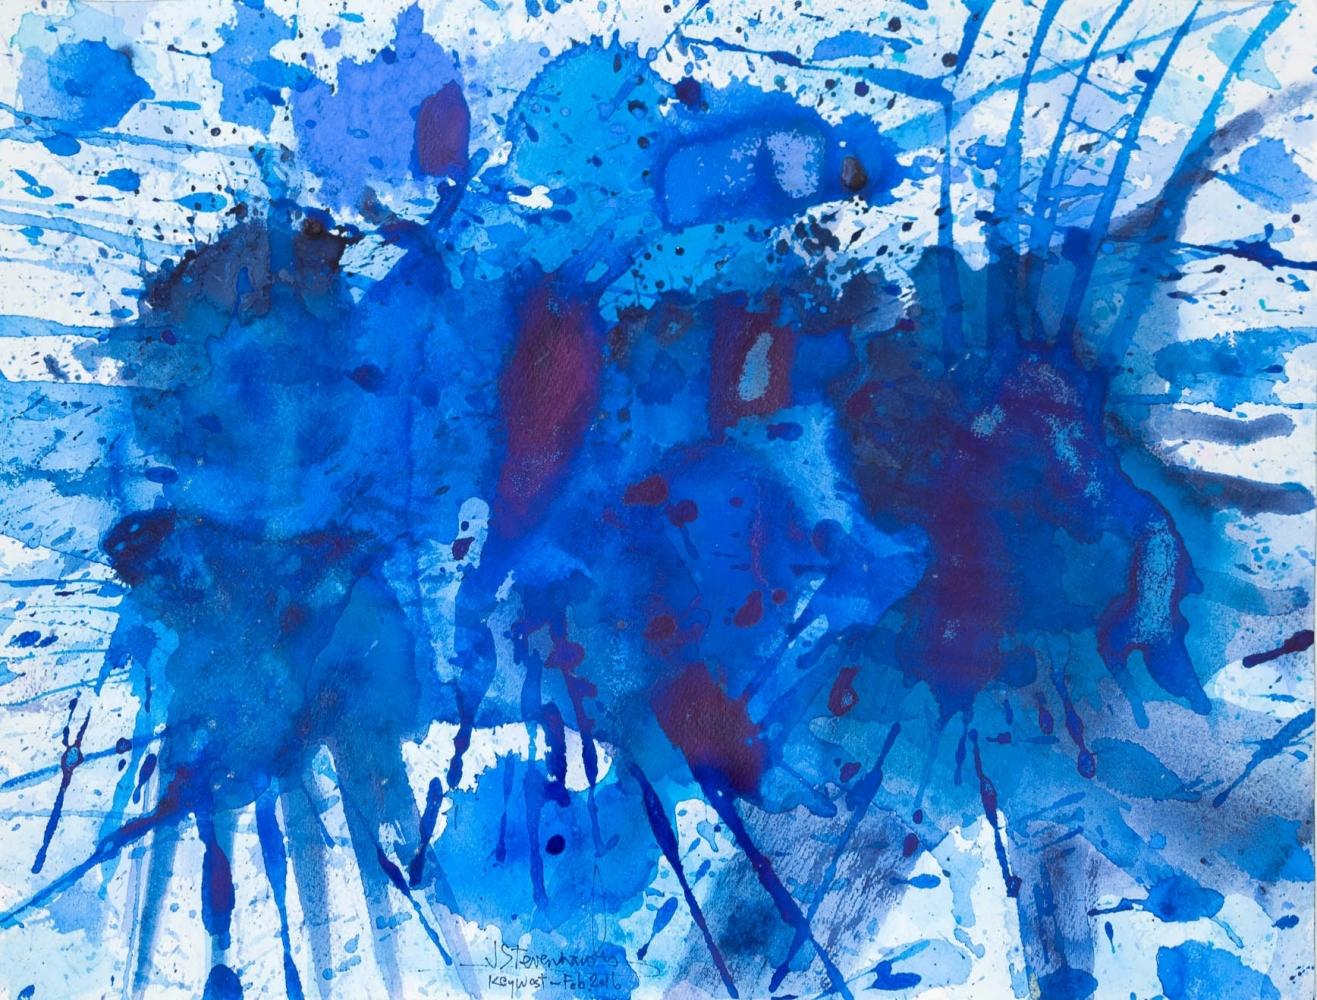 J. Steven Manolis, Splash-Key West (12.18.08), 2016, Watercolor, Acrylic and Gouache on paper, 12 x 18 inches